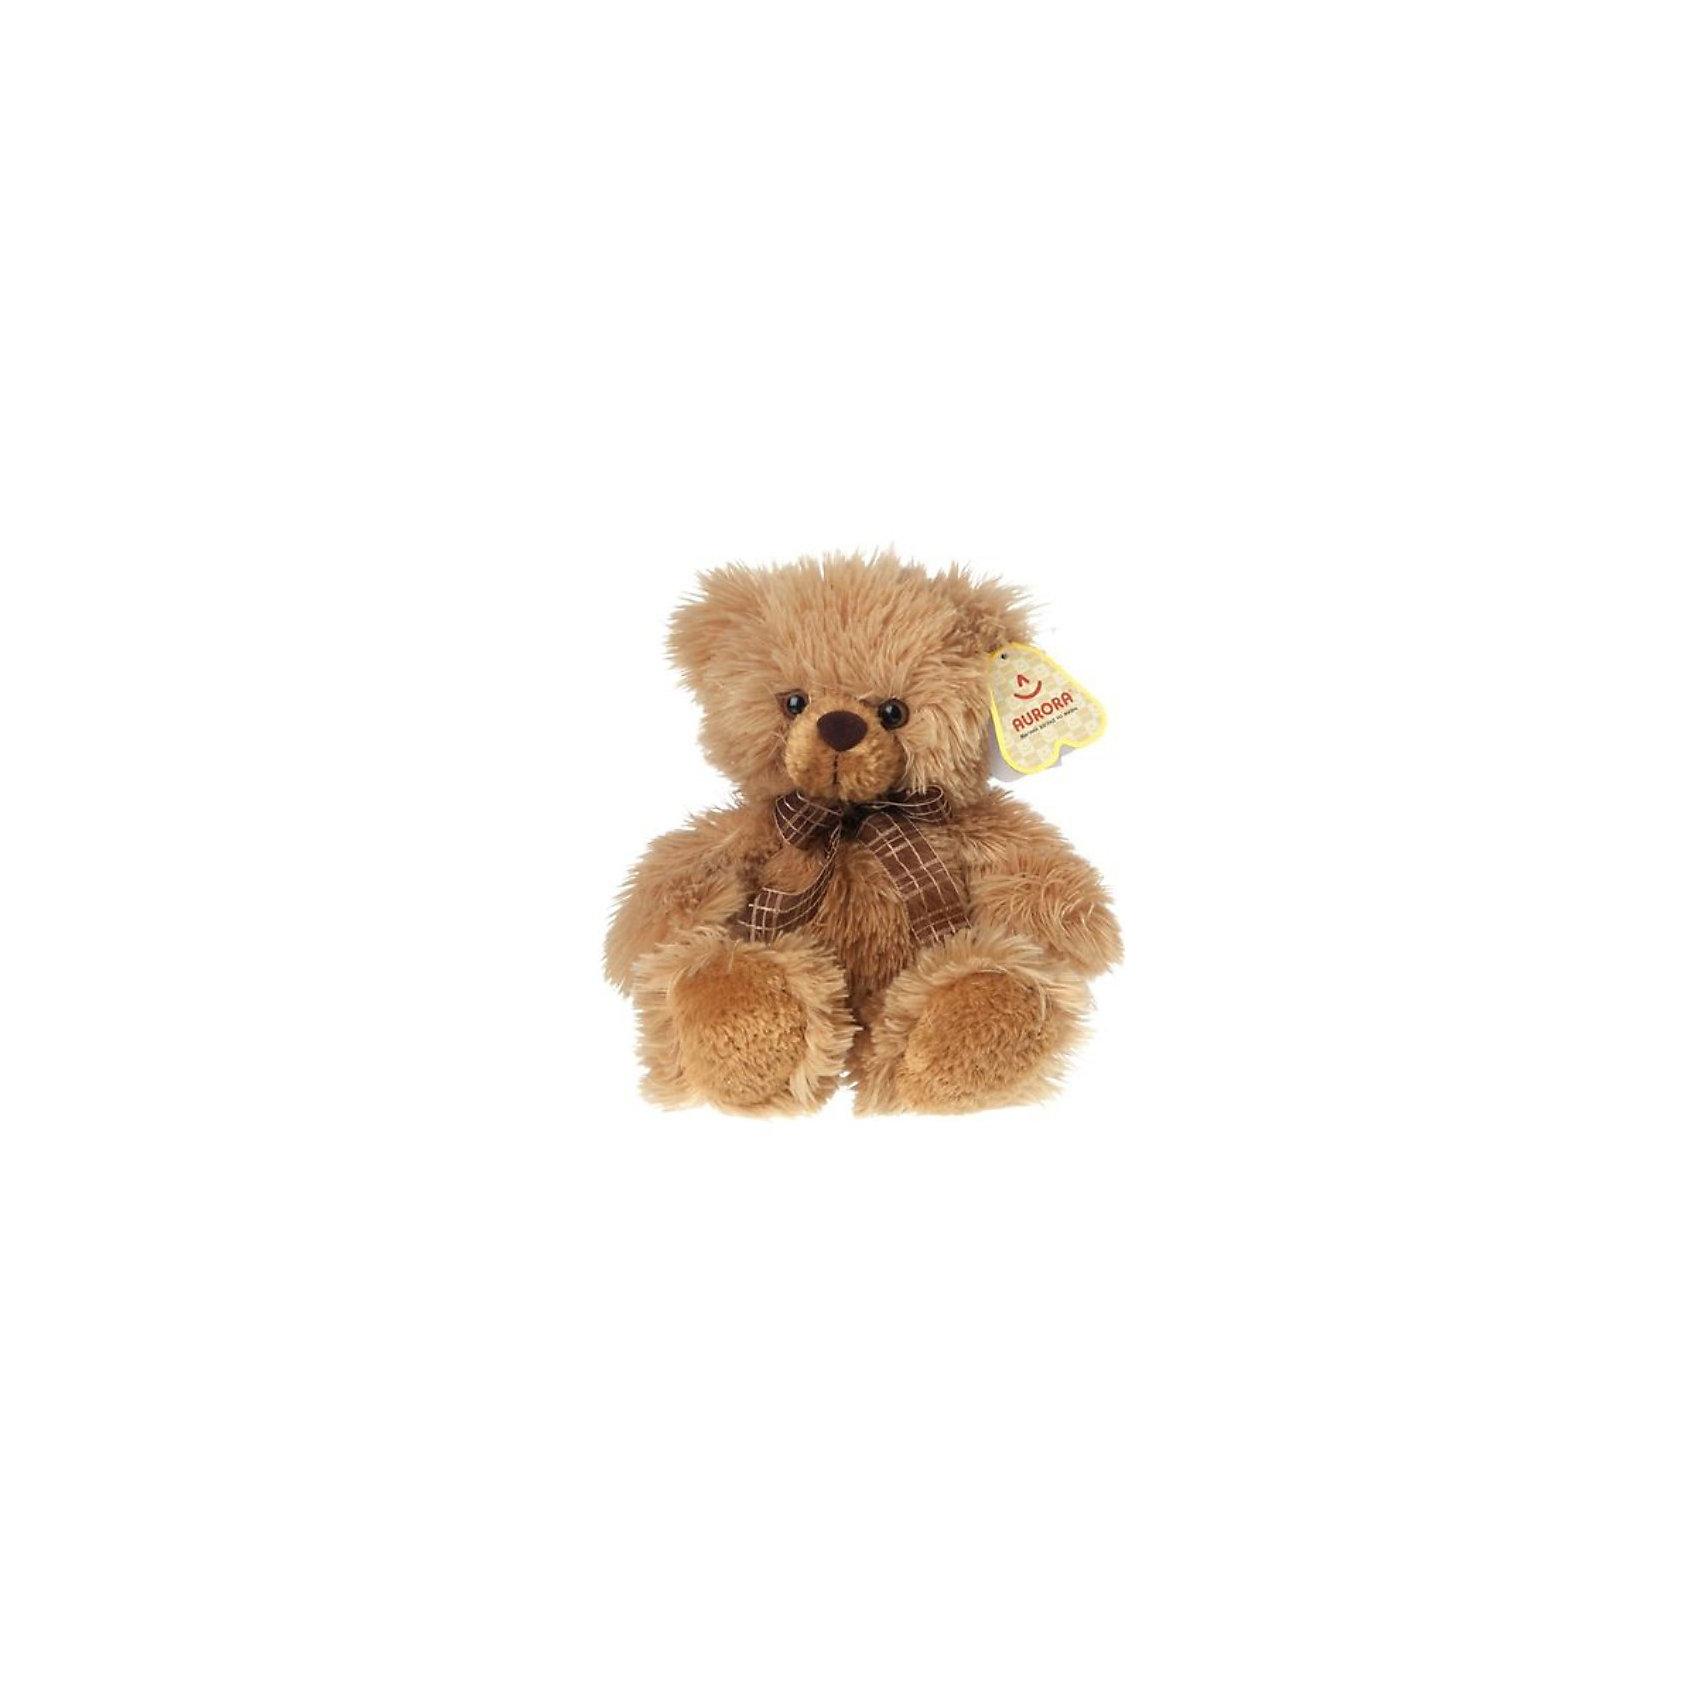 AURORA AURORA Мягкая игрушка Медведь, 46 см aurora мягкая игрушка тигр 28 см